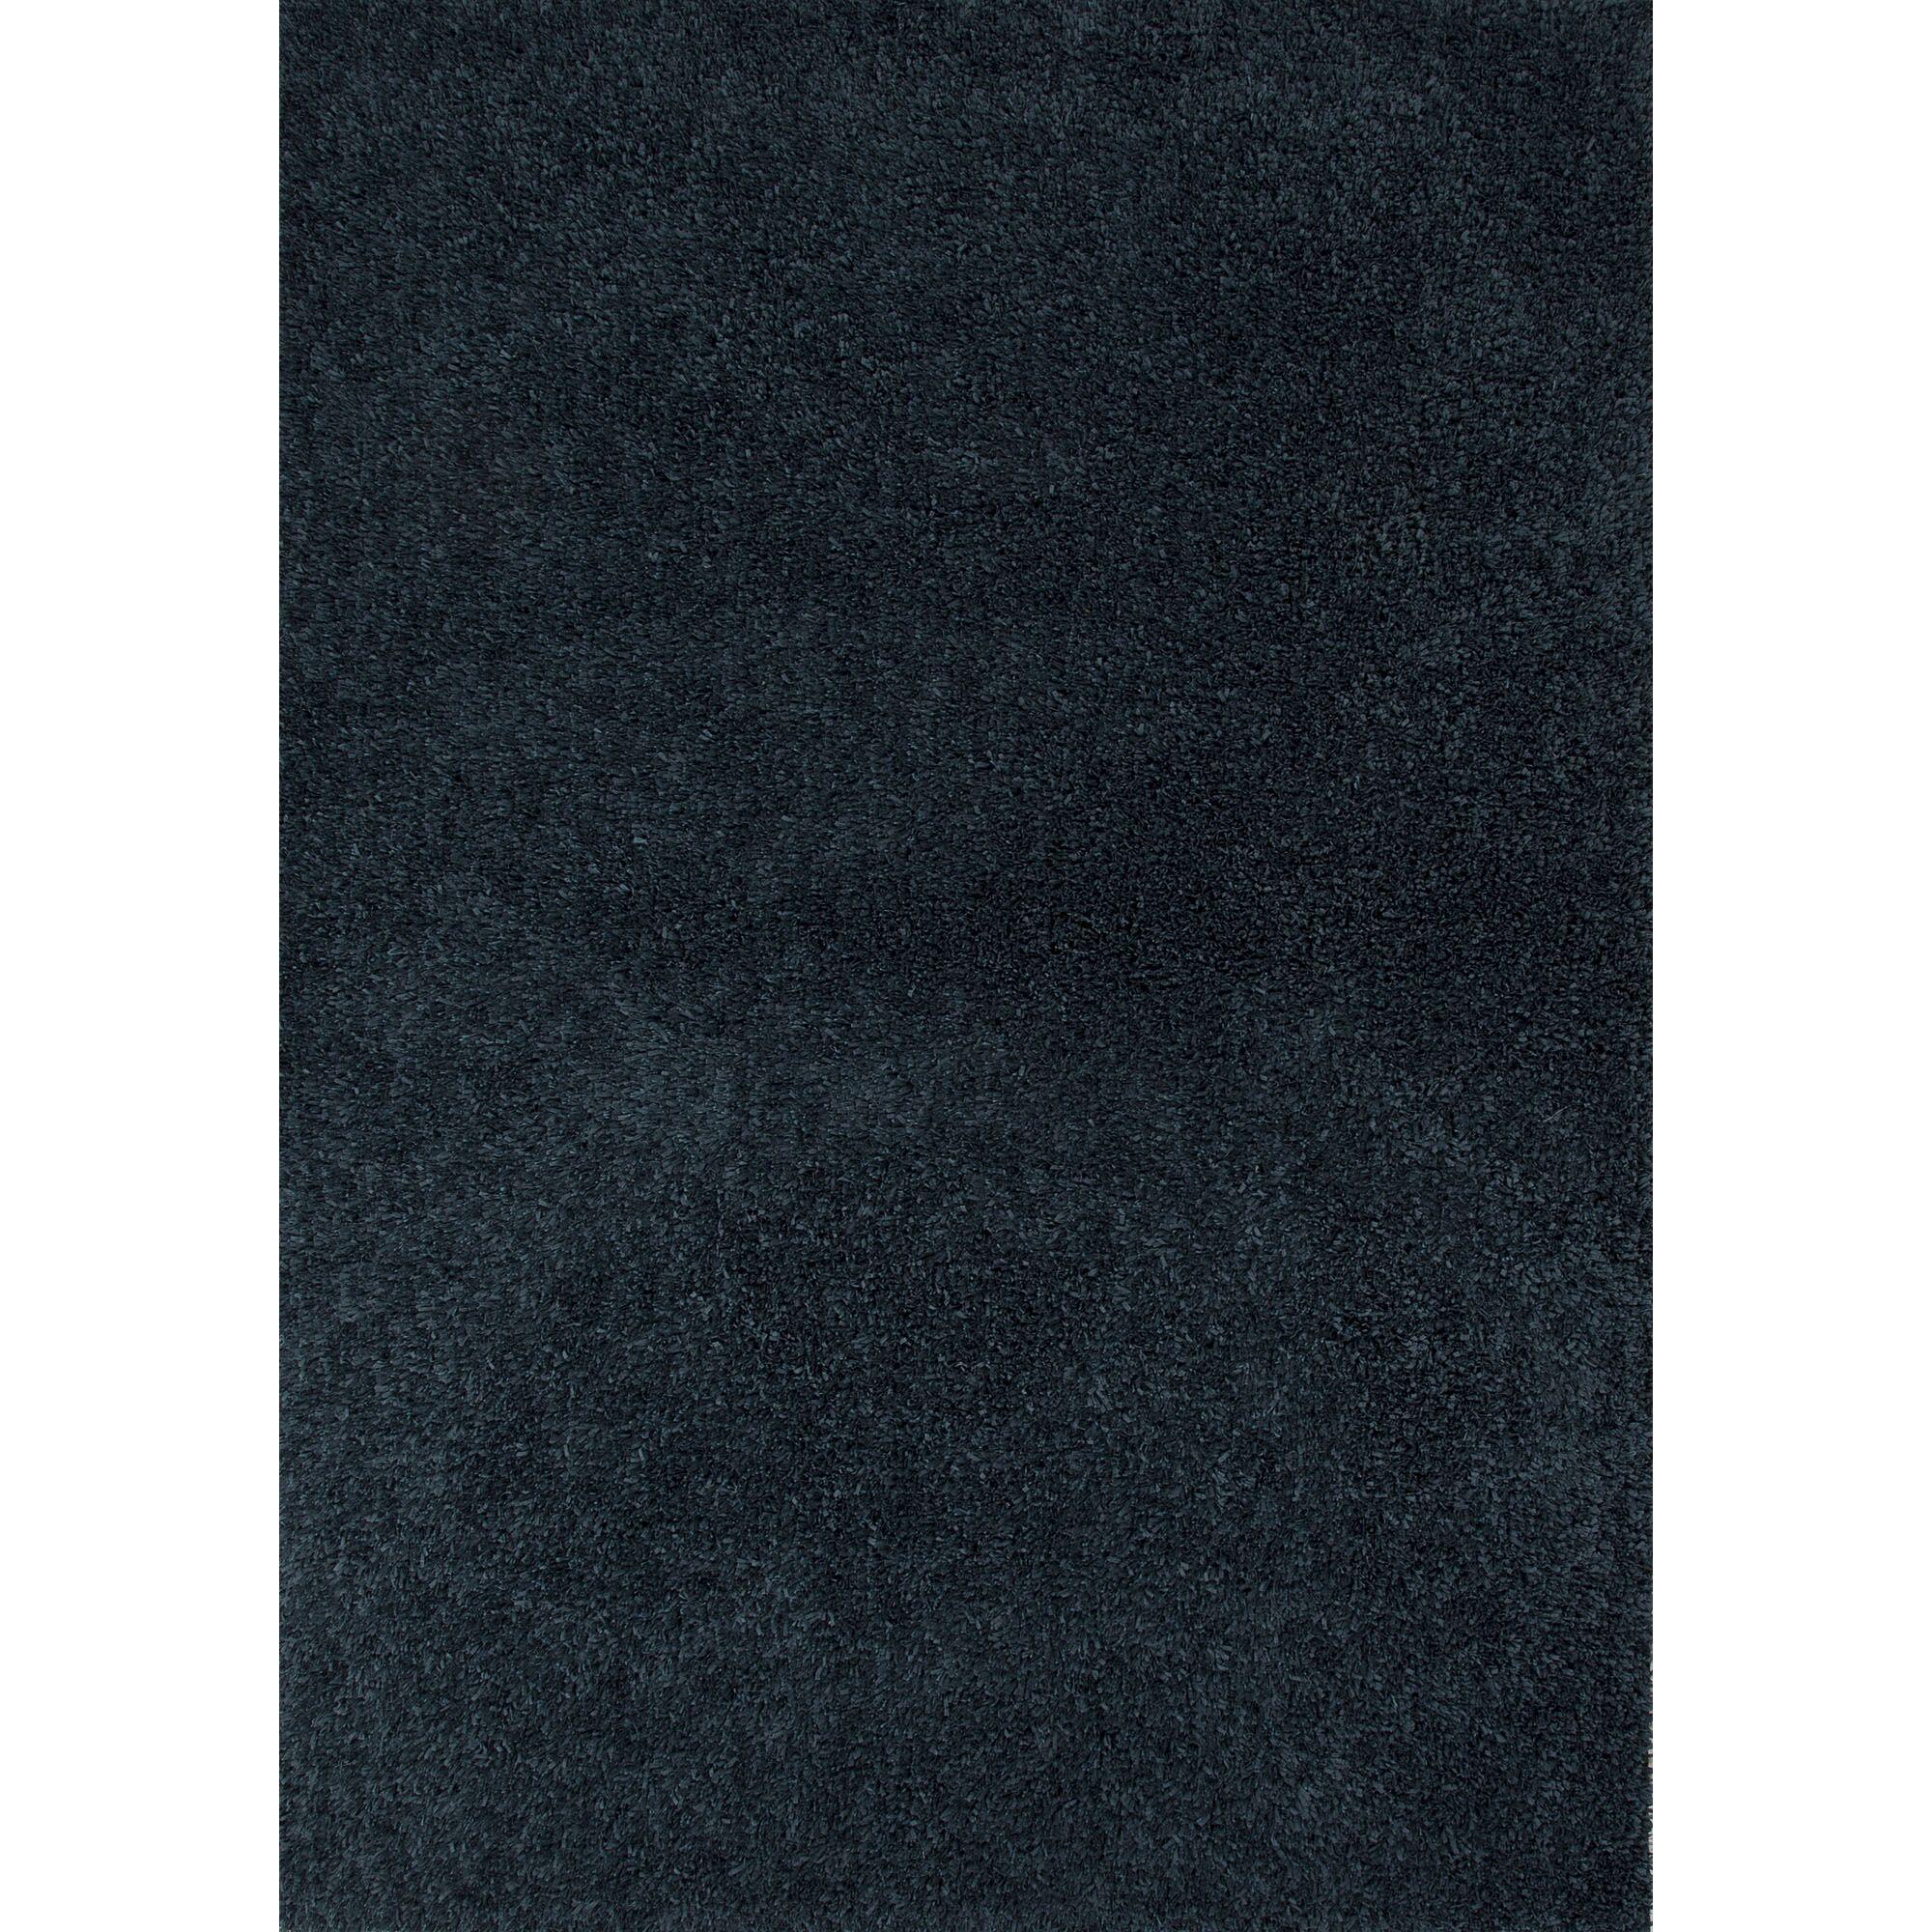 Brys Polyester Blue Shag Area Rug Rug Size: 7'6